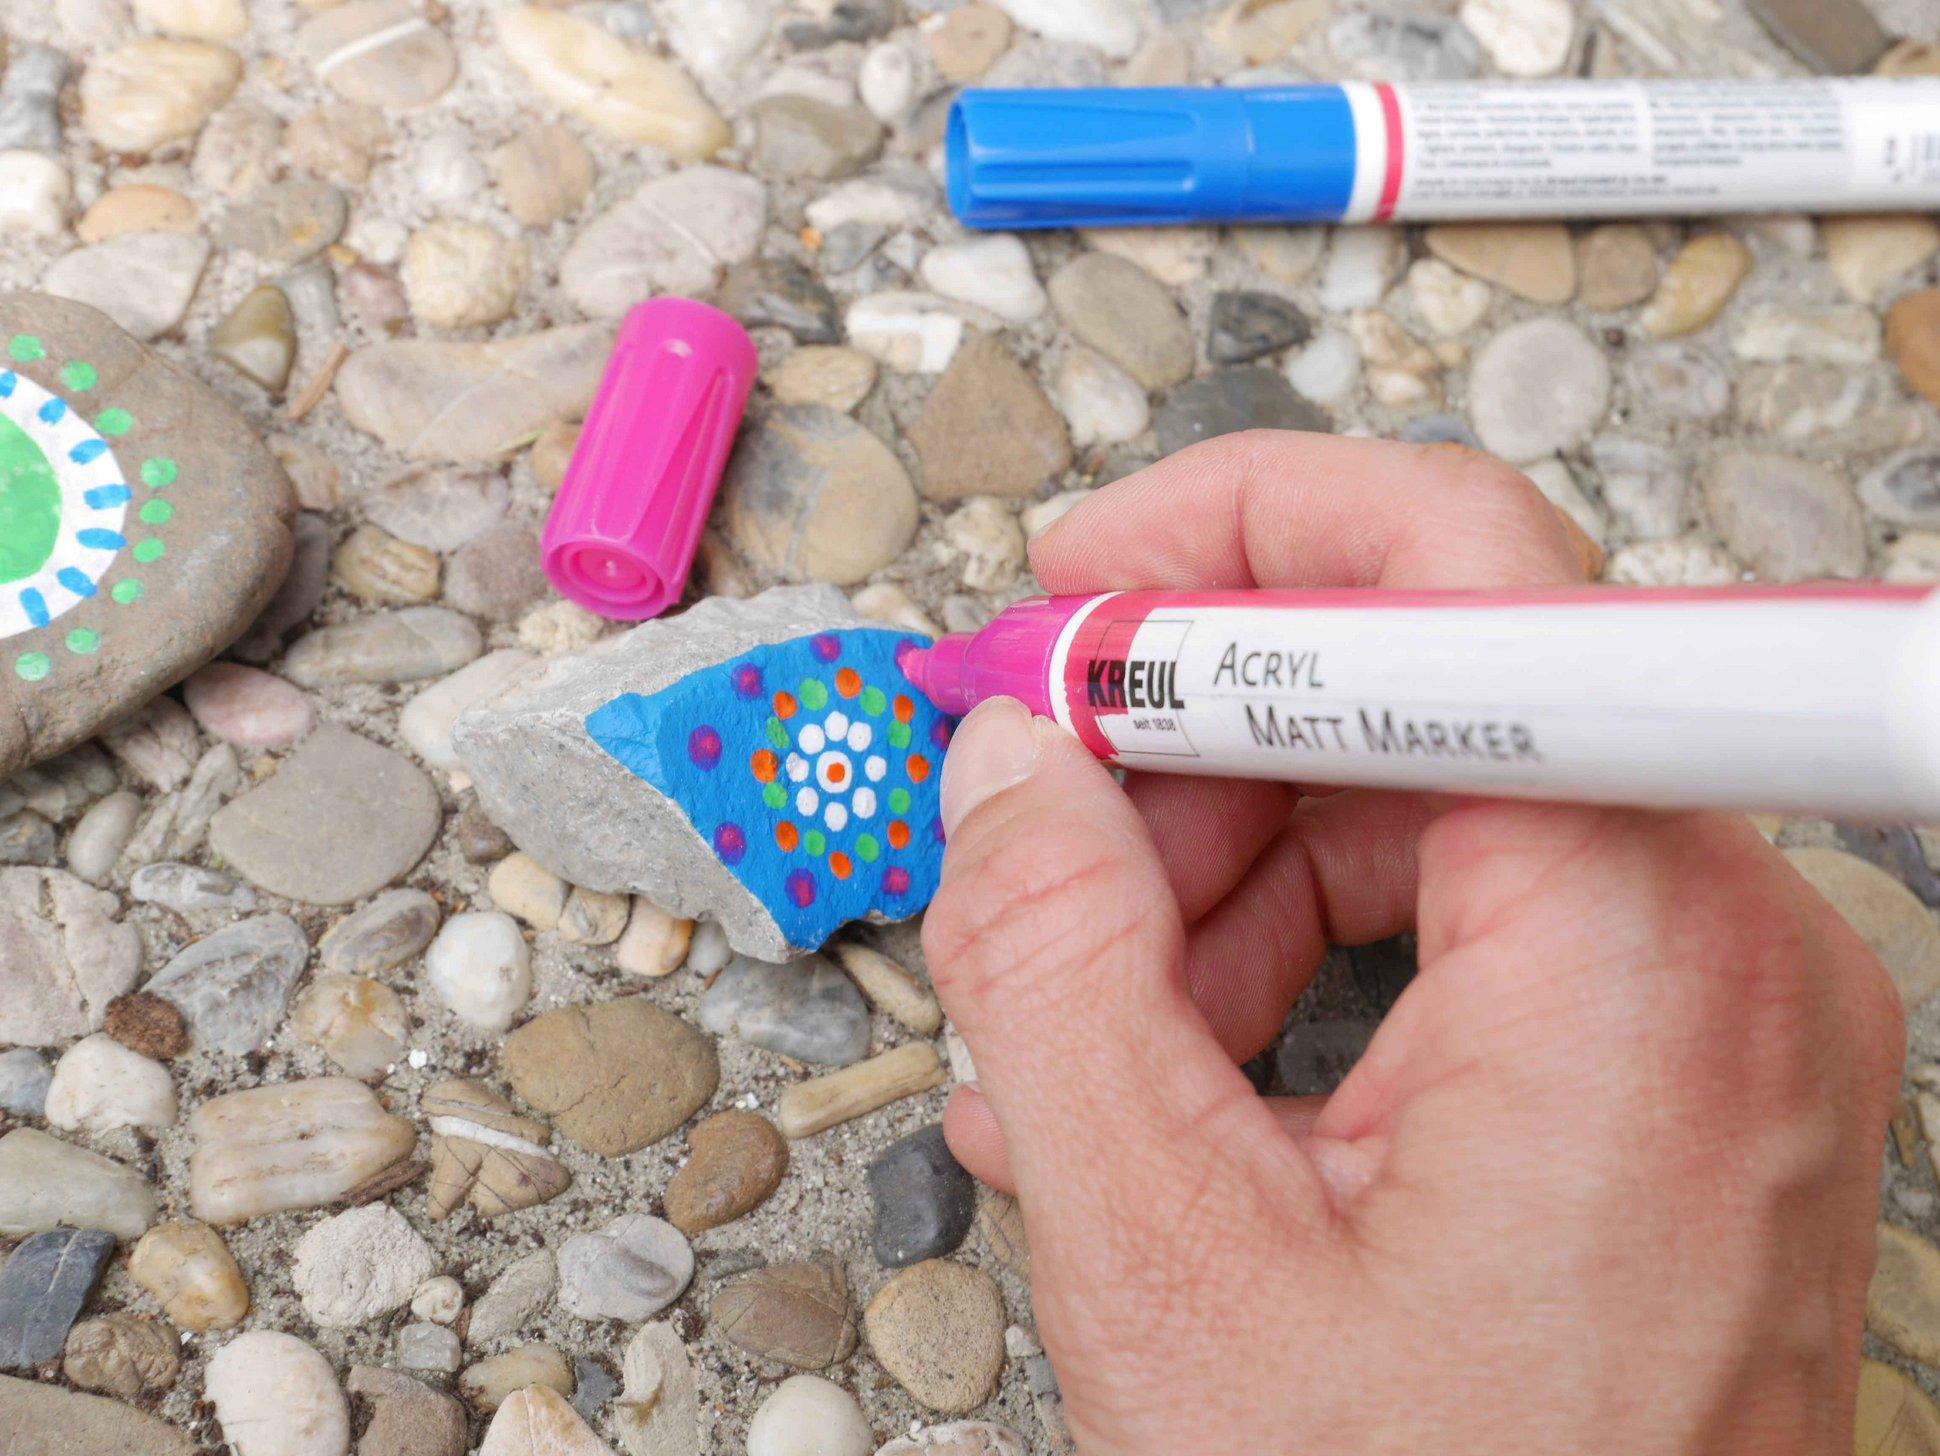 KREUL Acrylstift Steine anmalen verzieren